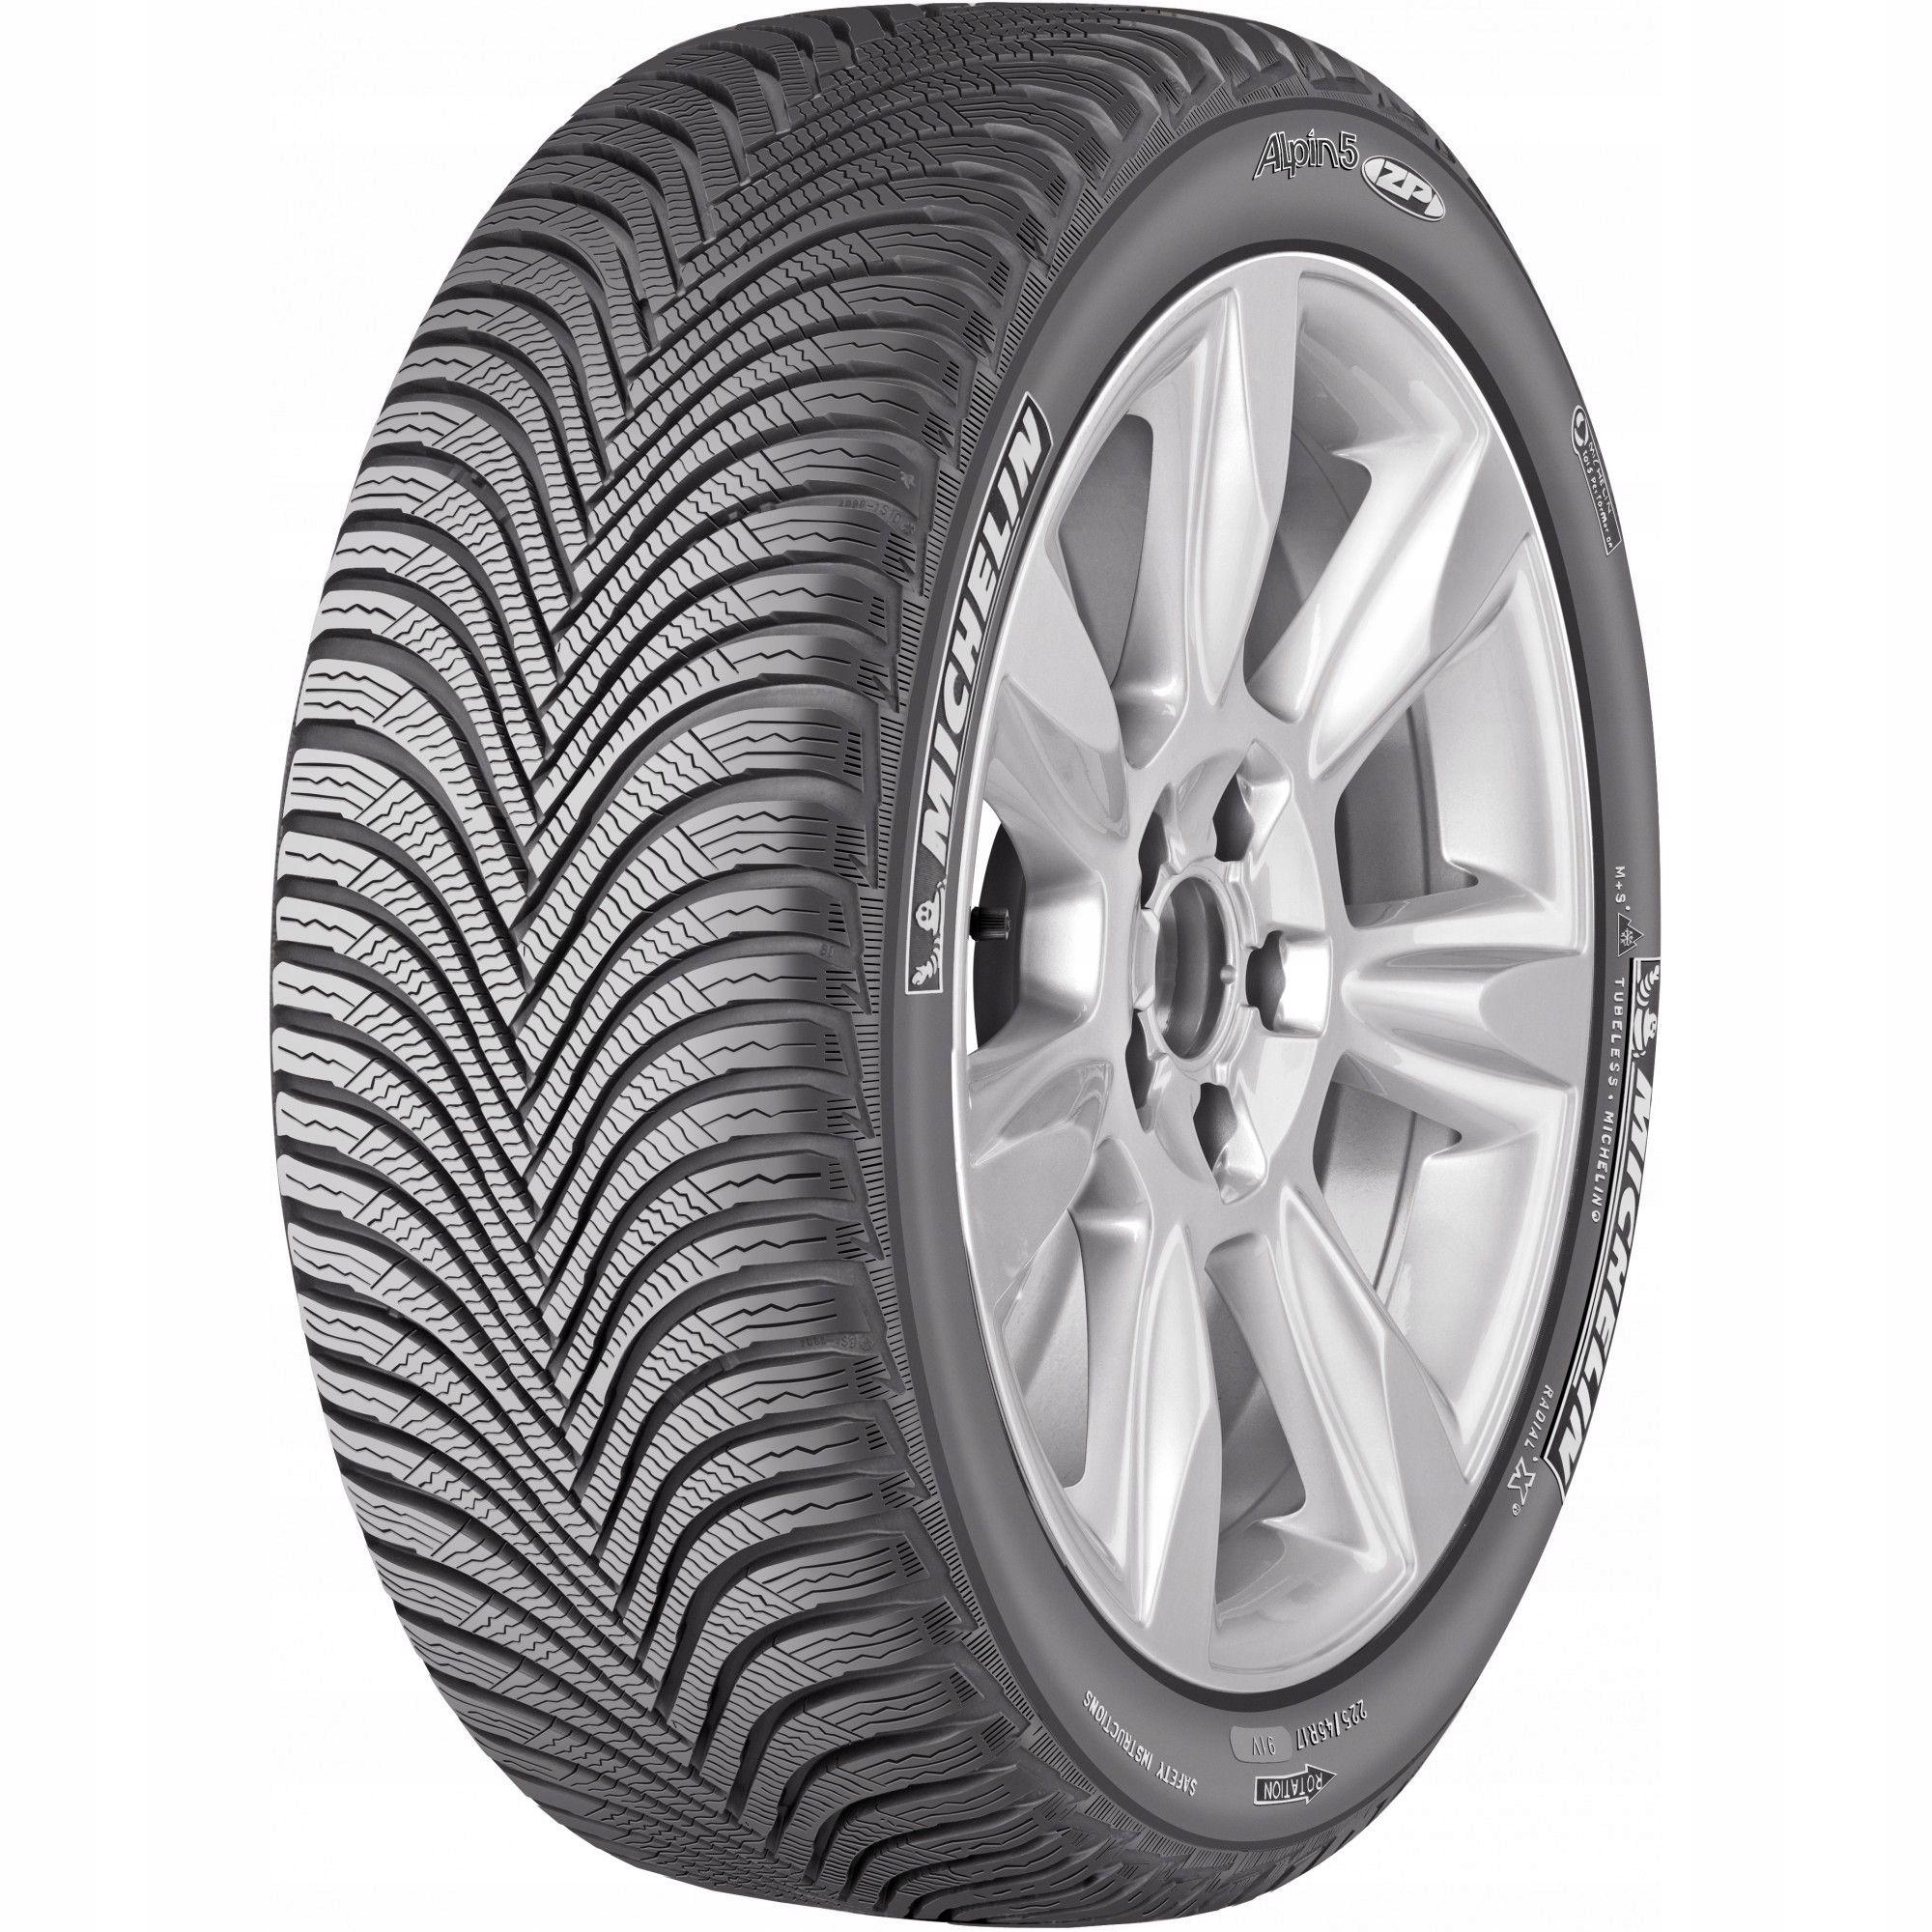 Opony Zimowe Michelin 20560r16